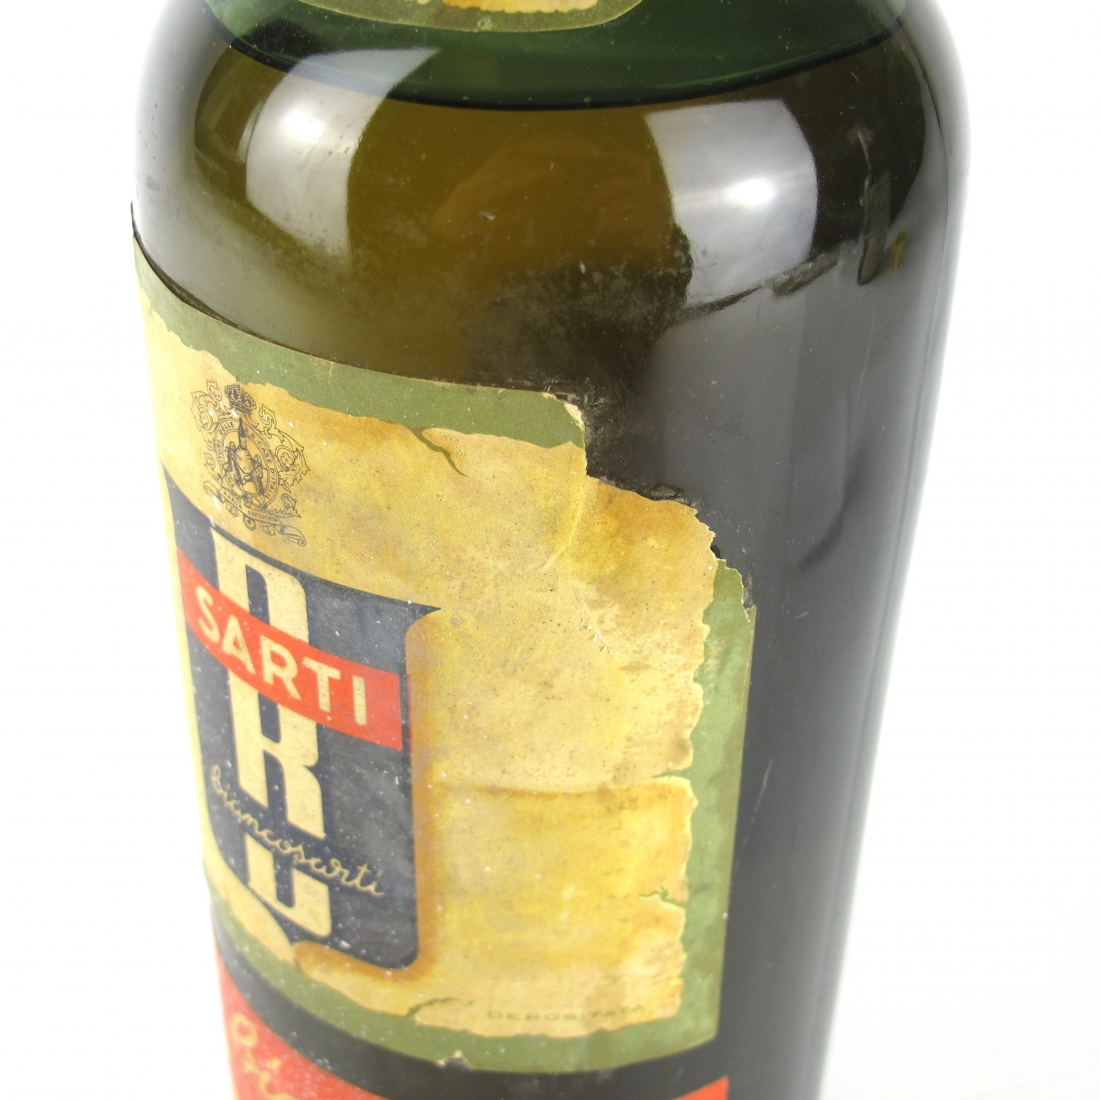 Sarti Bianco Circa 1950s